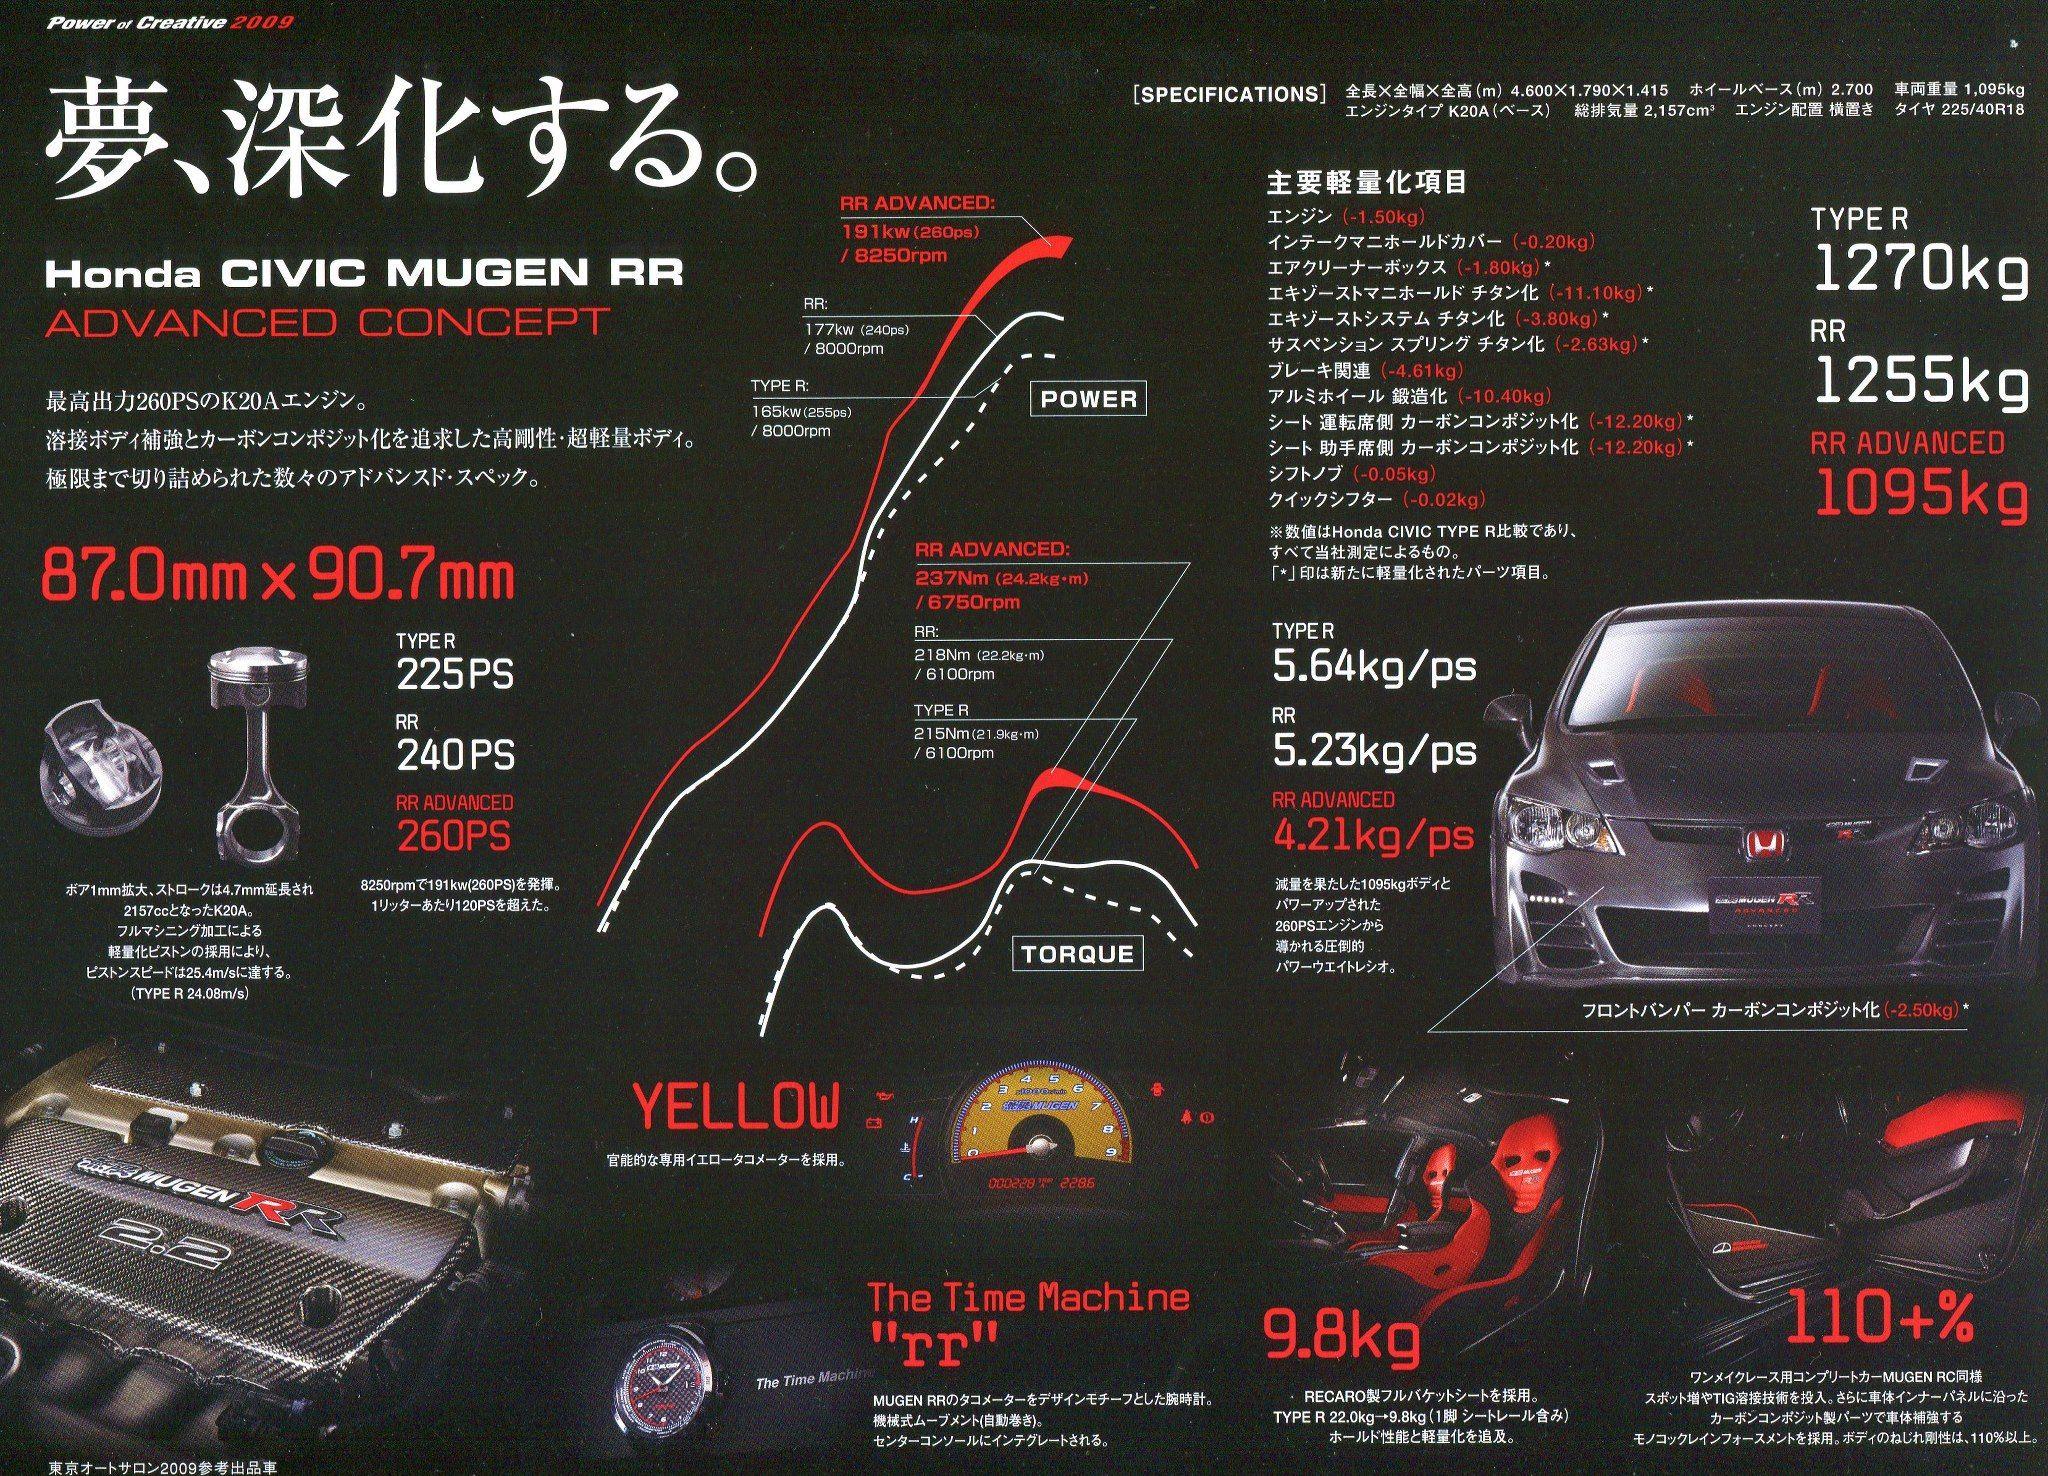 King Motorsports Official Blog Mugen Civic Rr Advanced Concept Civic Honda Civic Concept